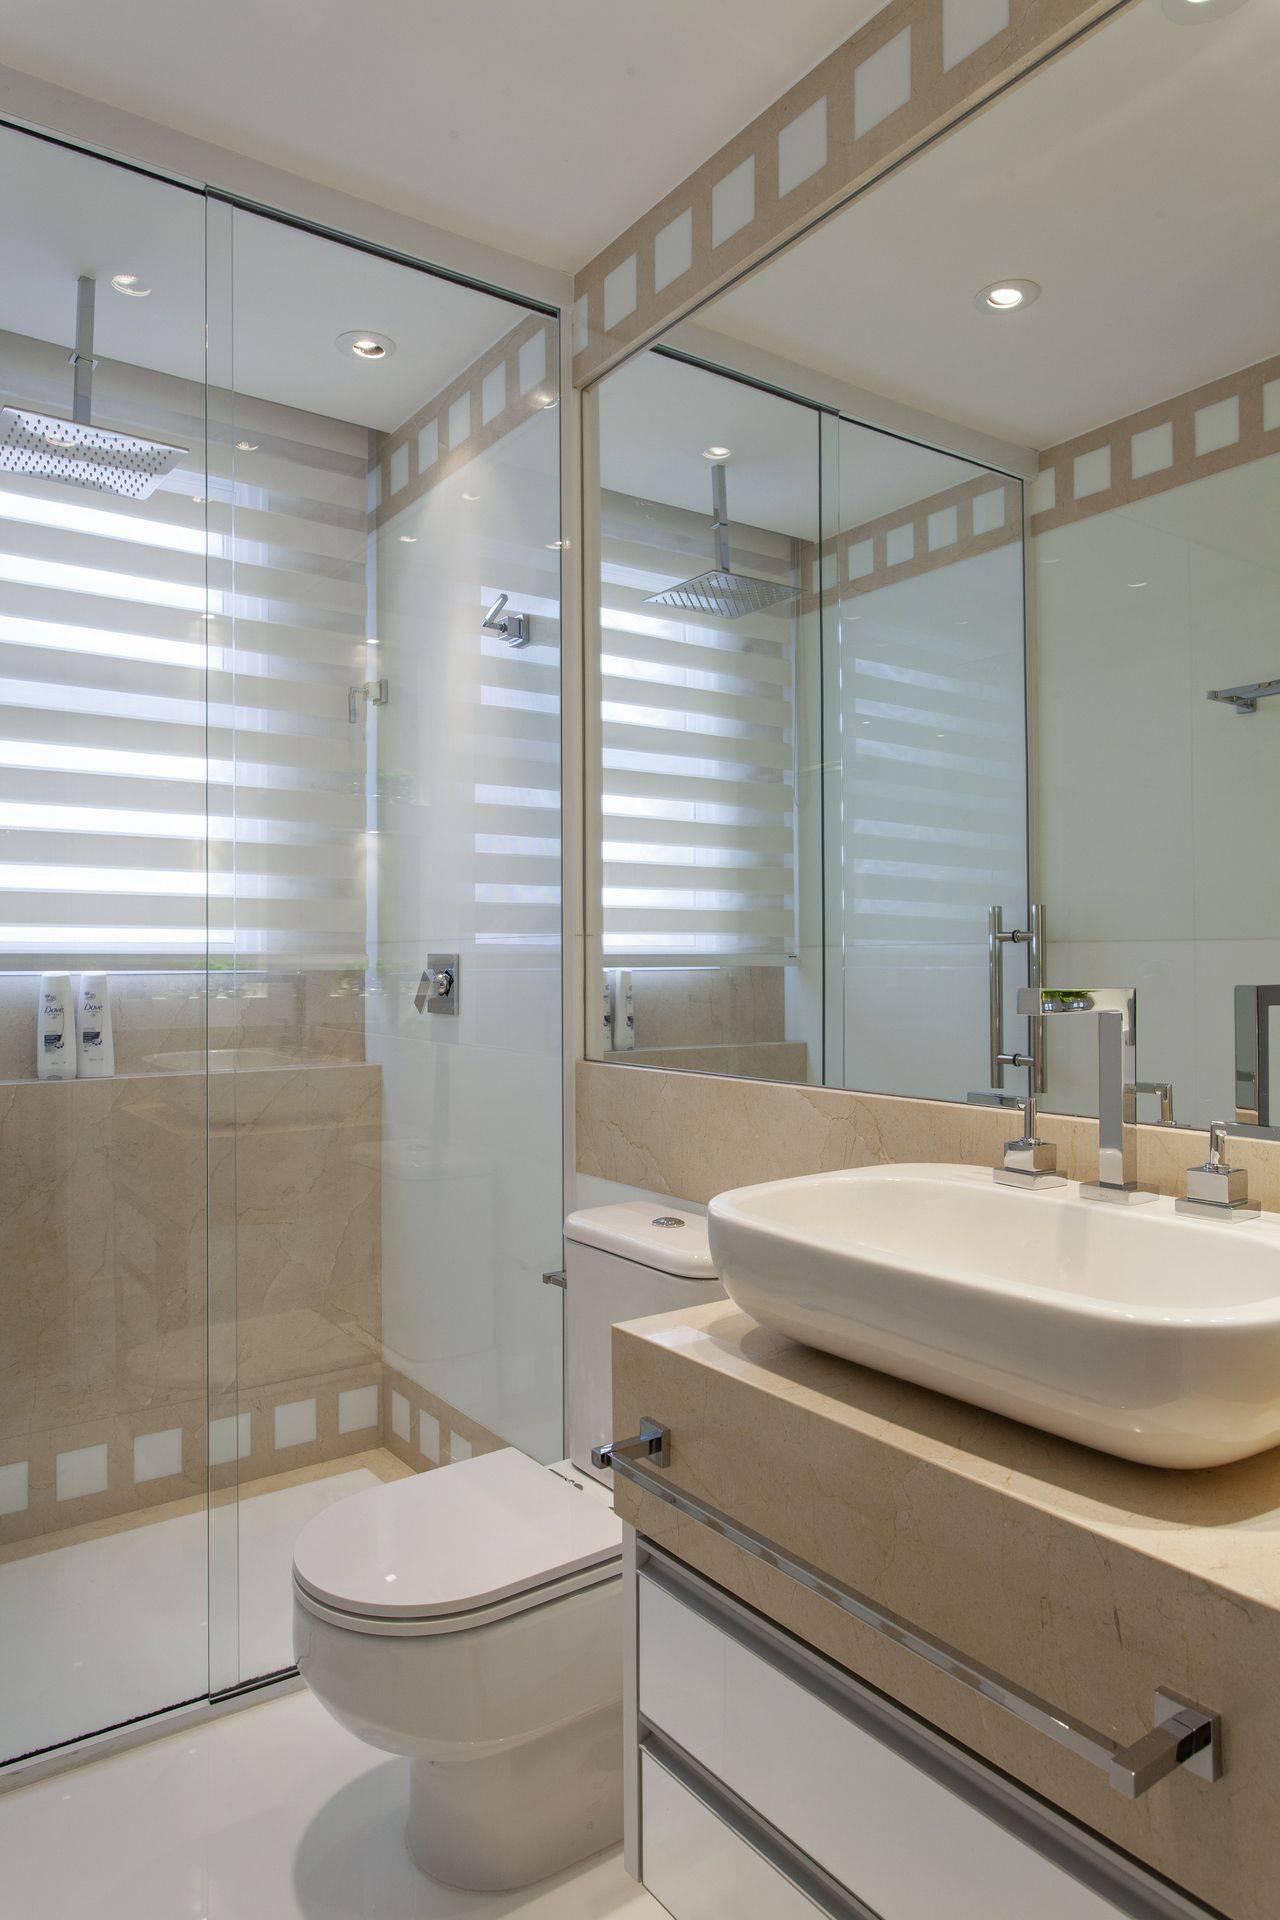 chuveiro banheiro iara kilaris 131999